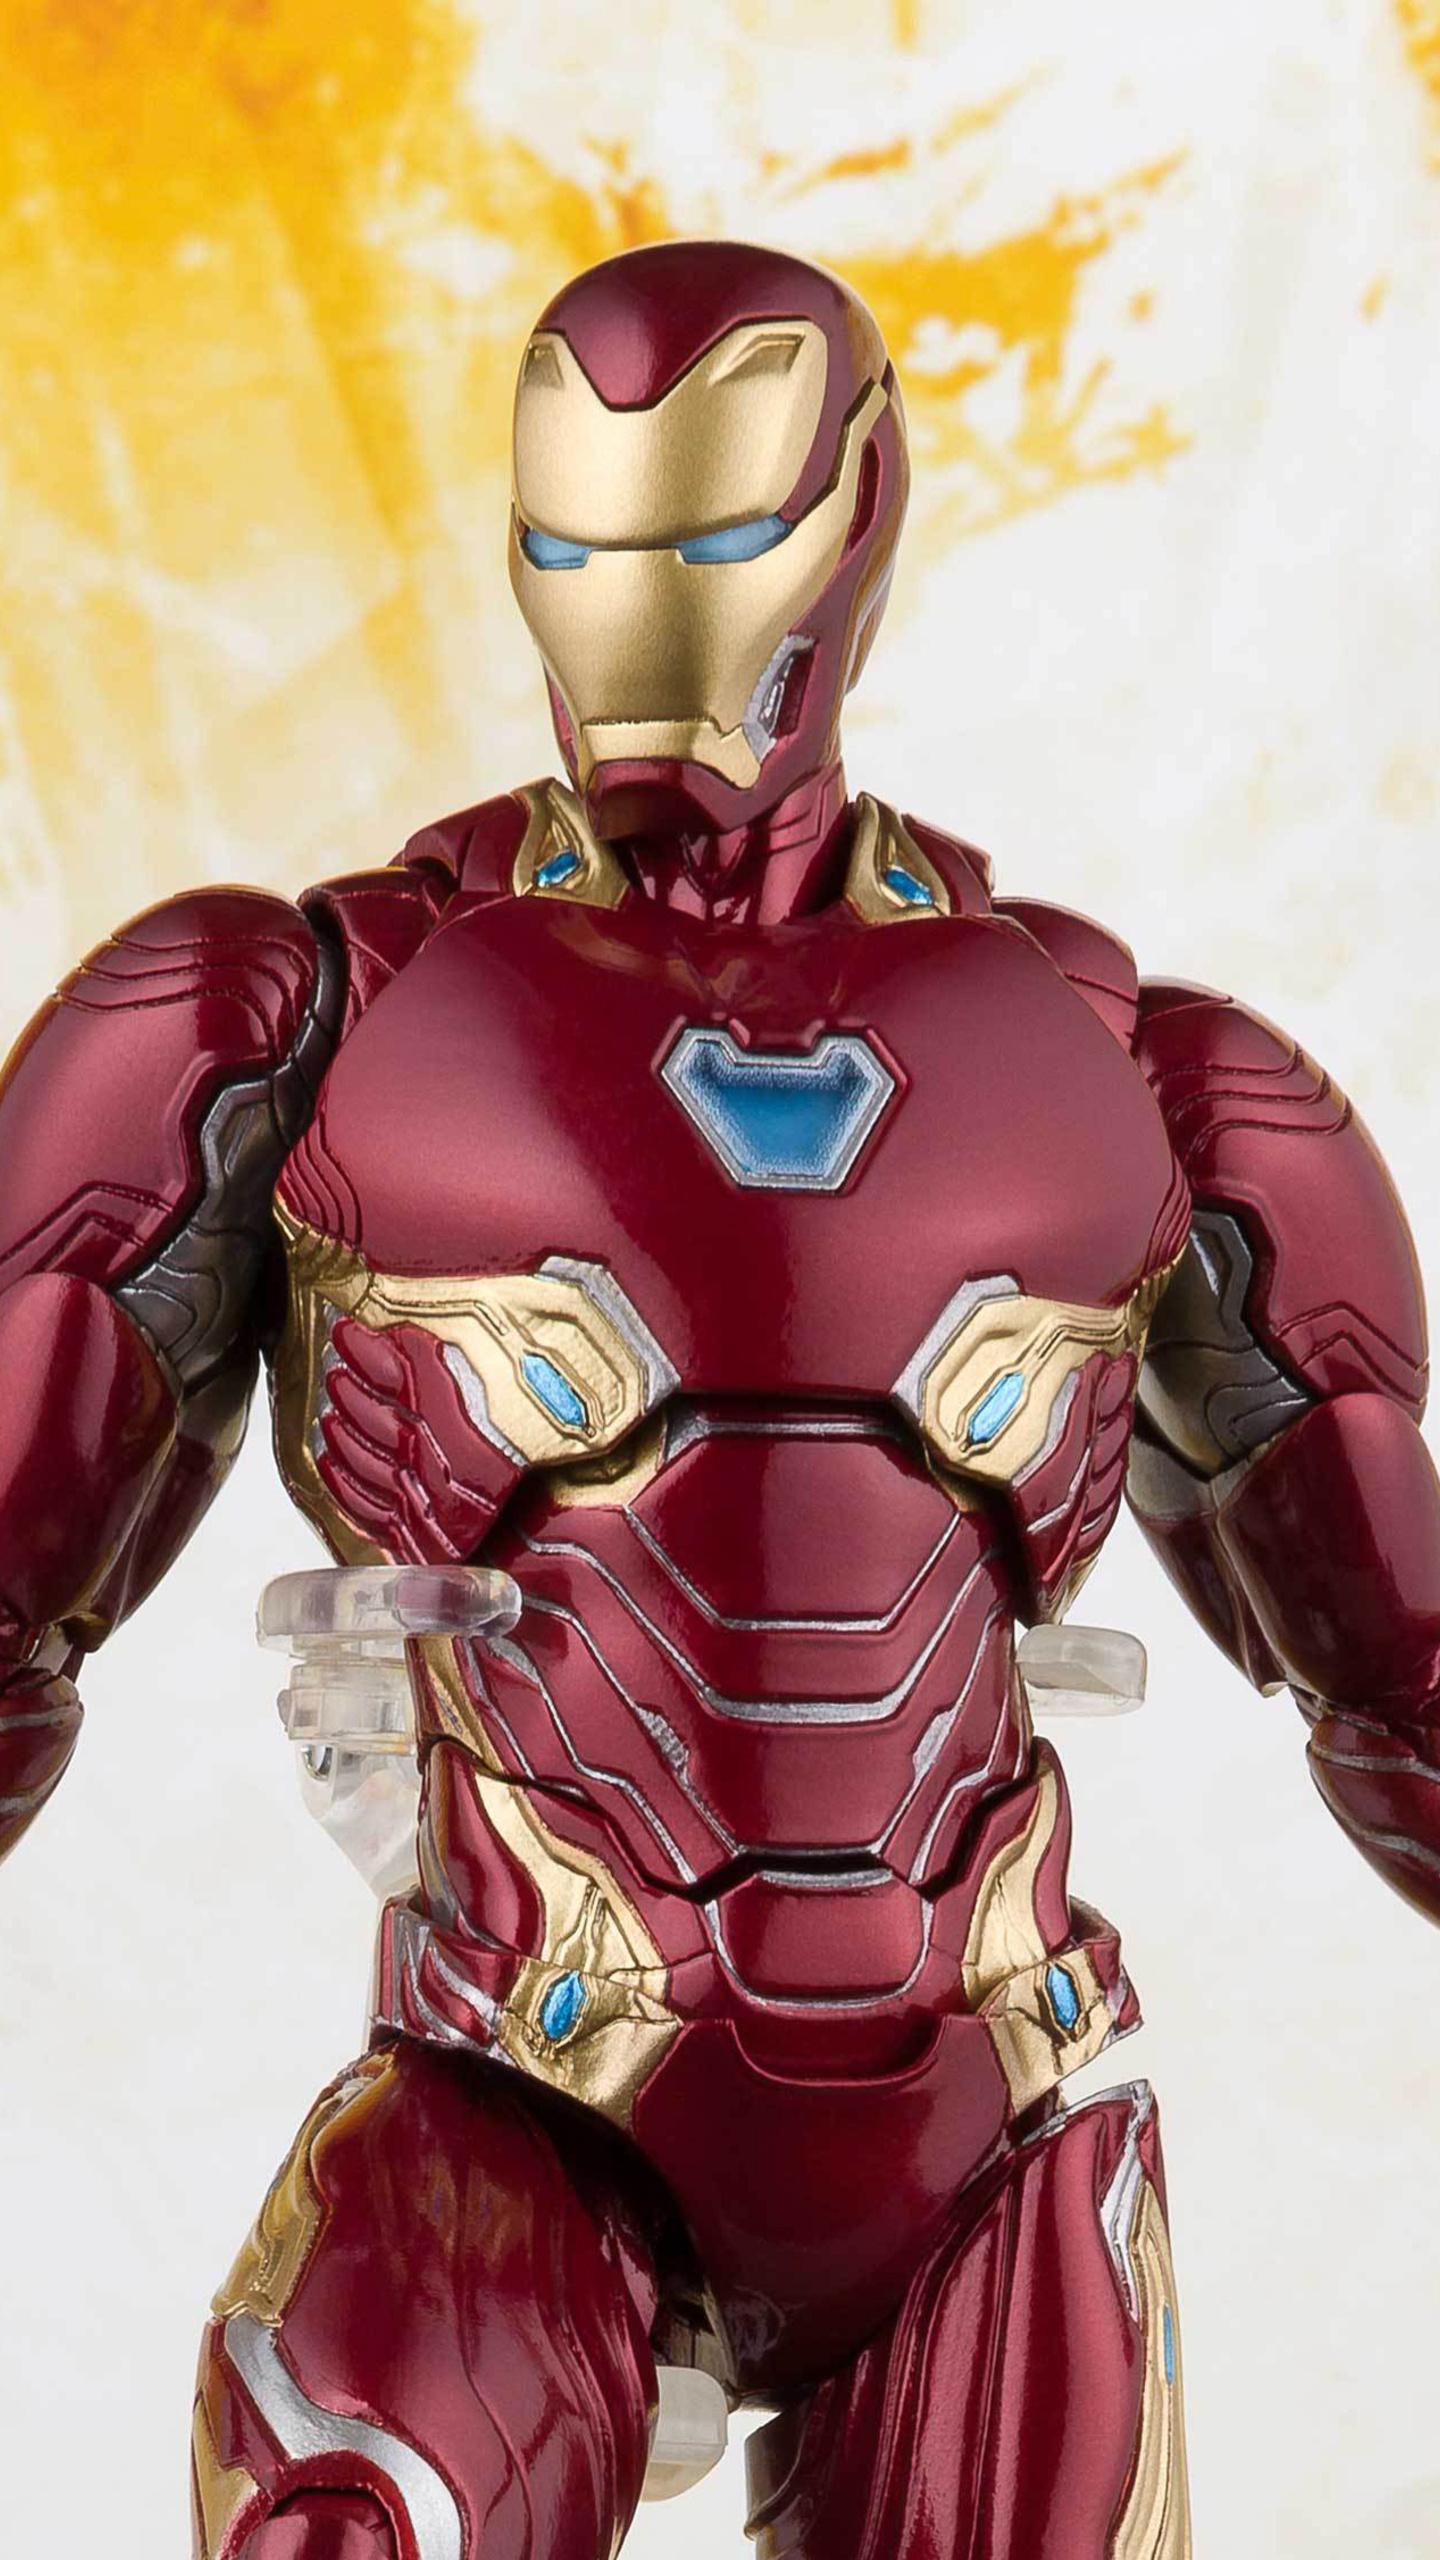 iron-man-avengers-infinity-war-toy-13.jpg